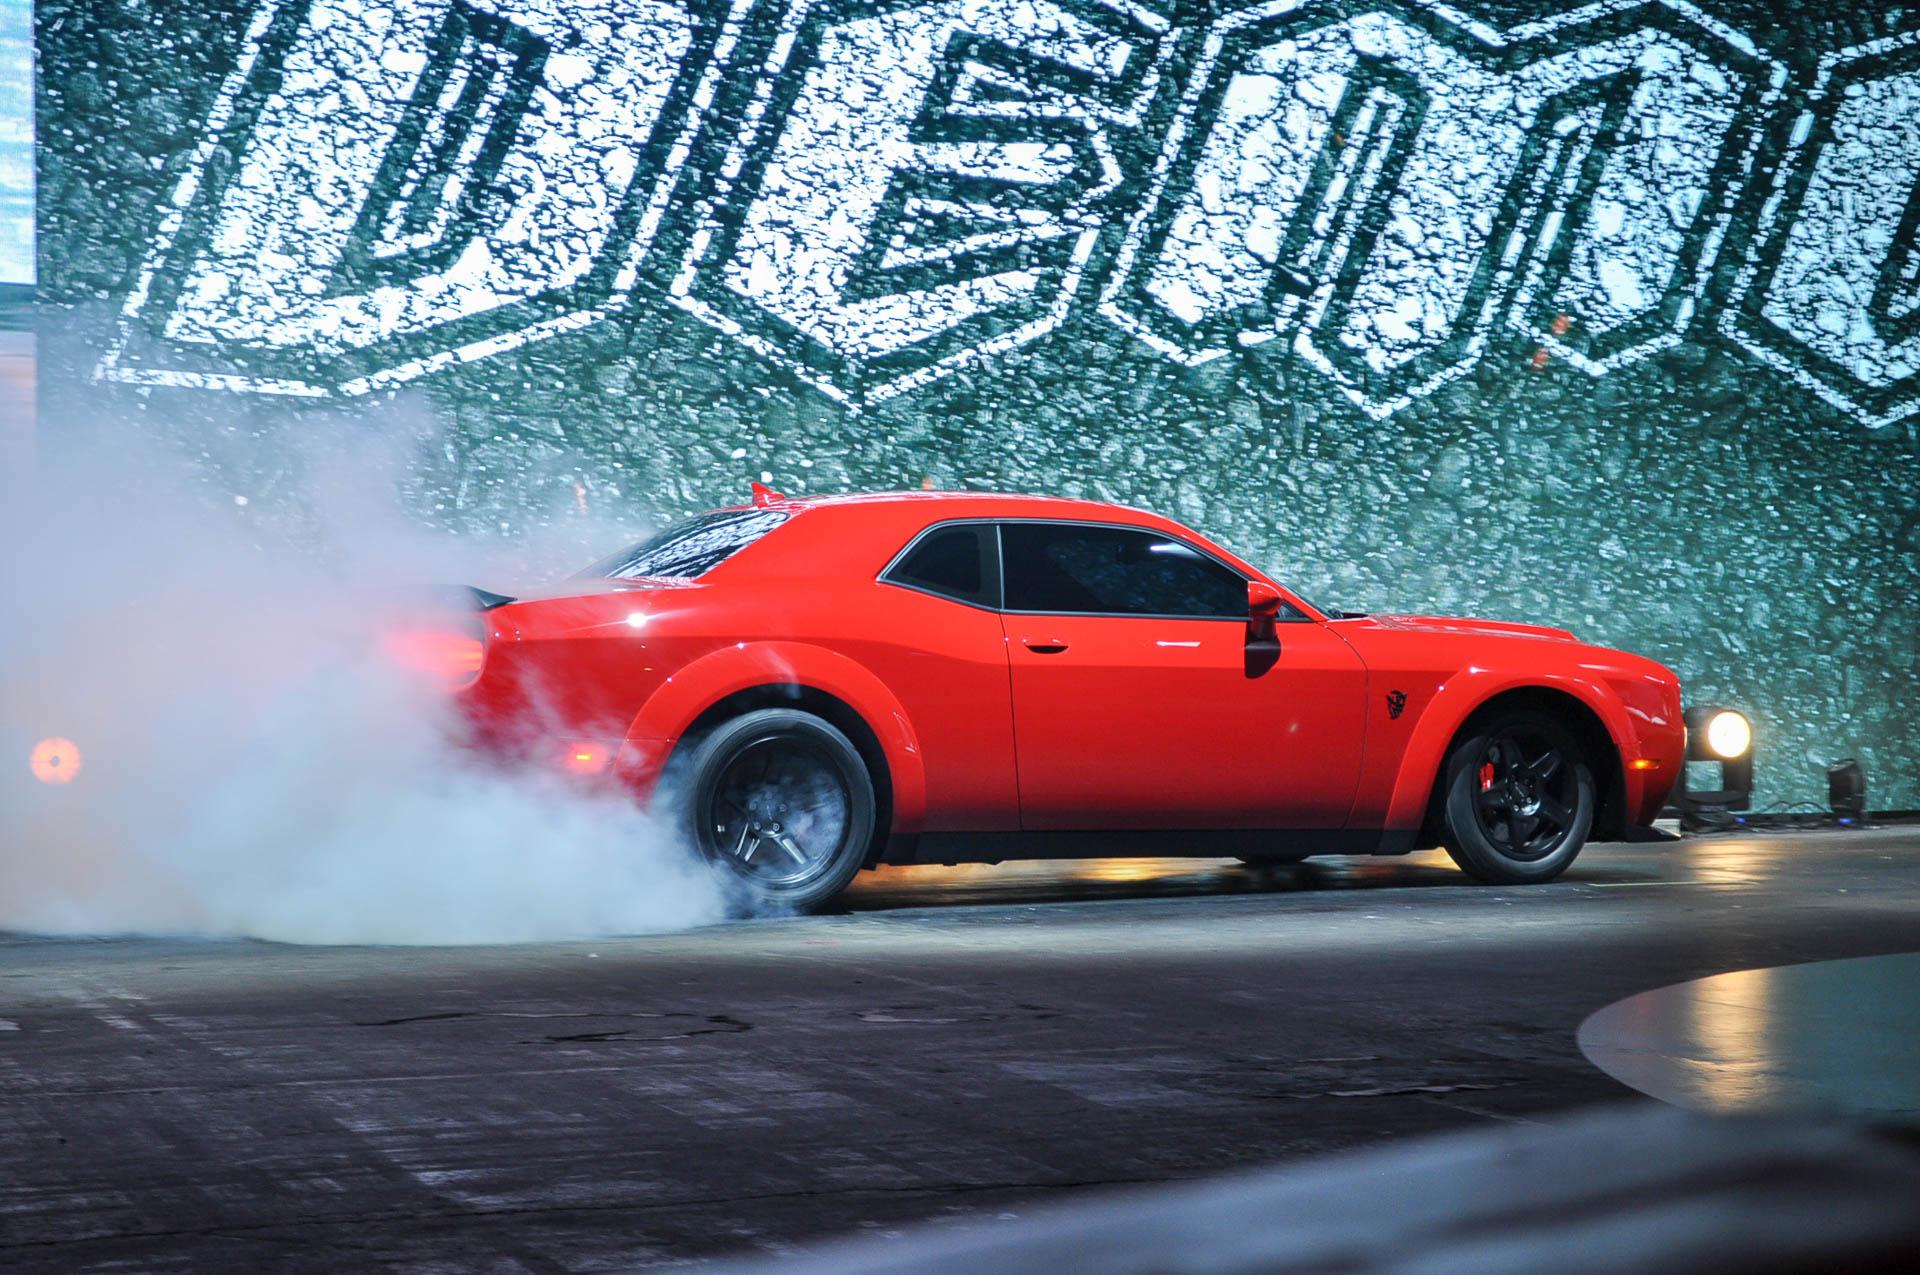 2018 Dodge Demon delivers 840 horsepower, does 0-60 in 2.3 seconds